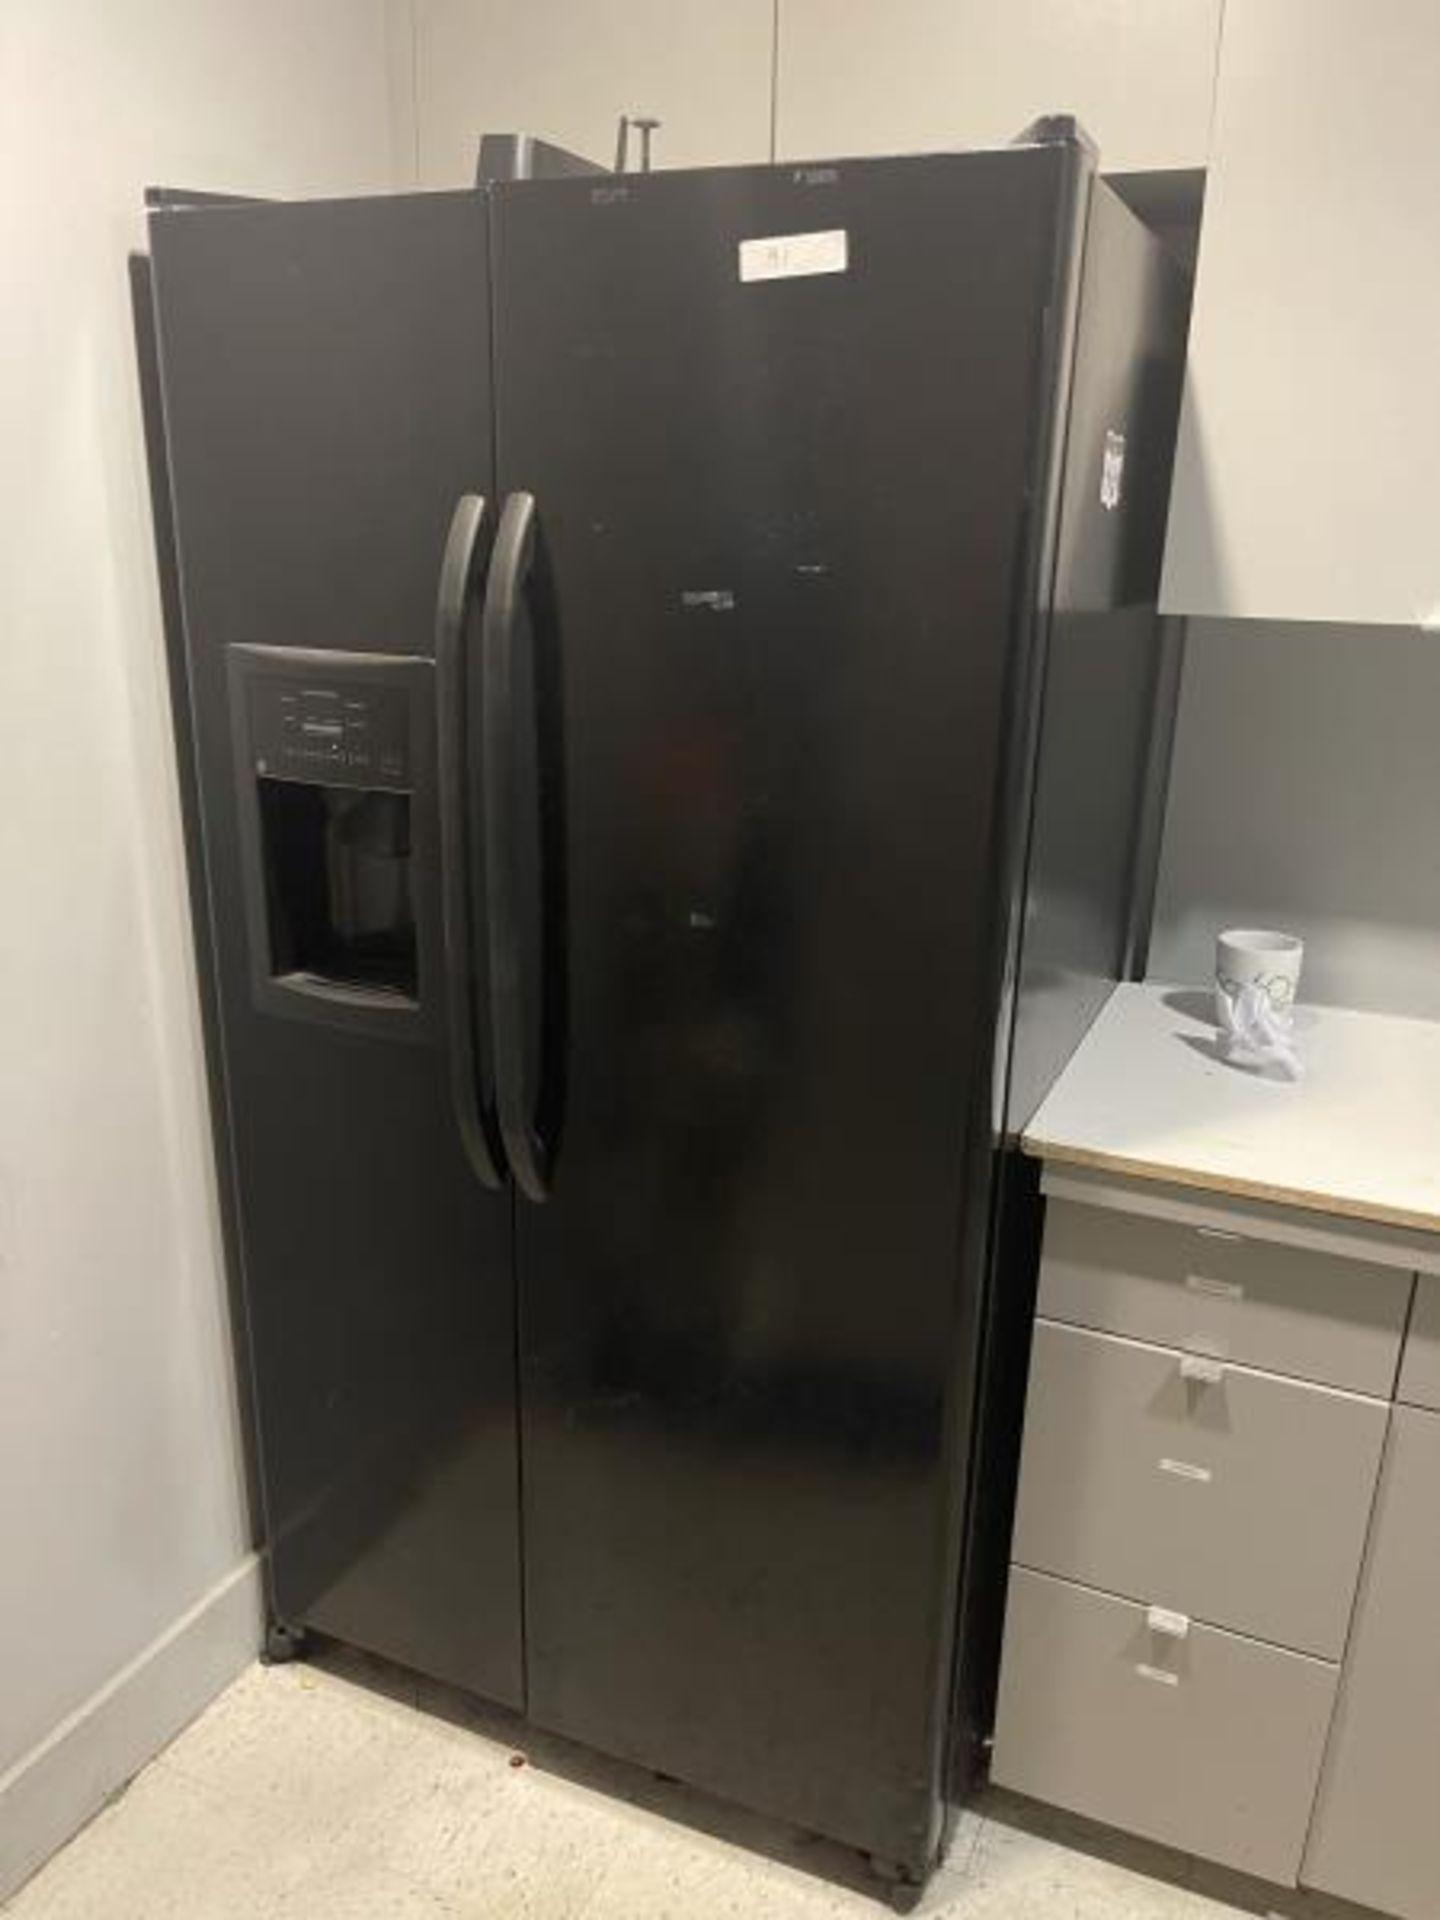 Amana French Dorr Refrigerator with Ice Machine (Needs Refrigerator Door Gasket) M: GSH25JFYNDB